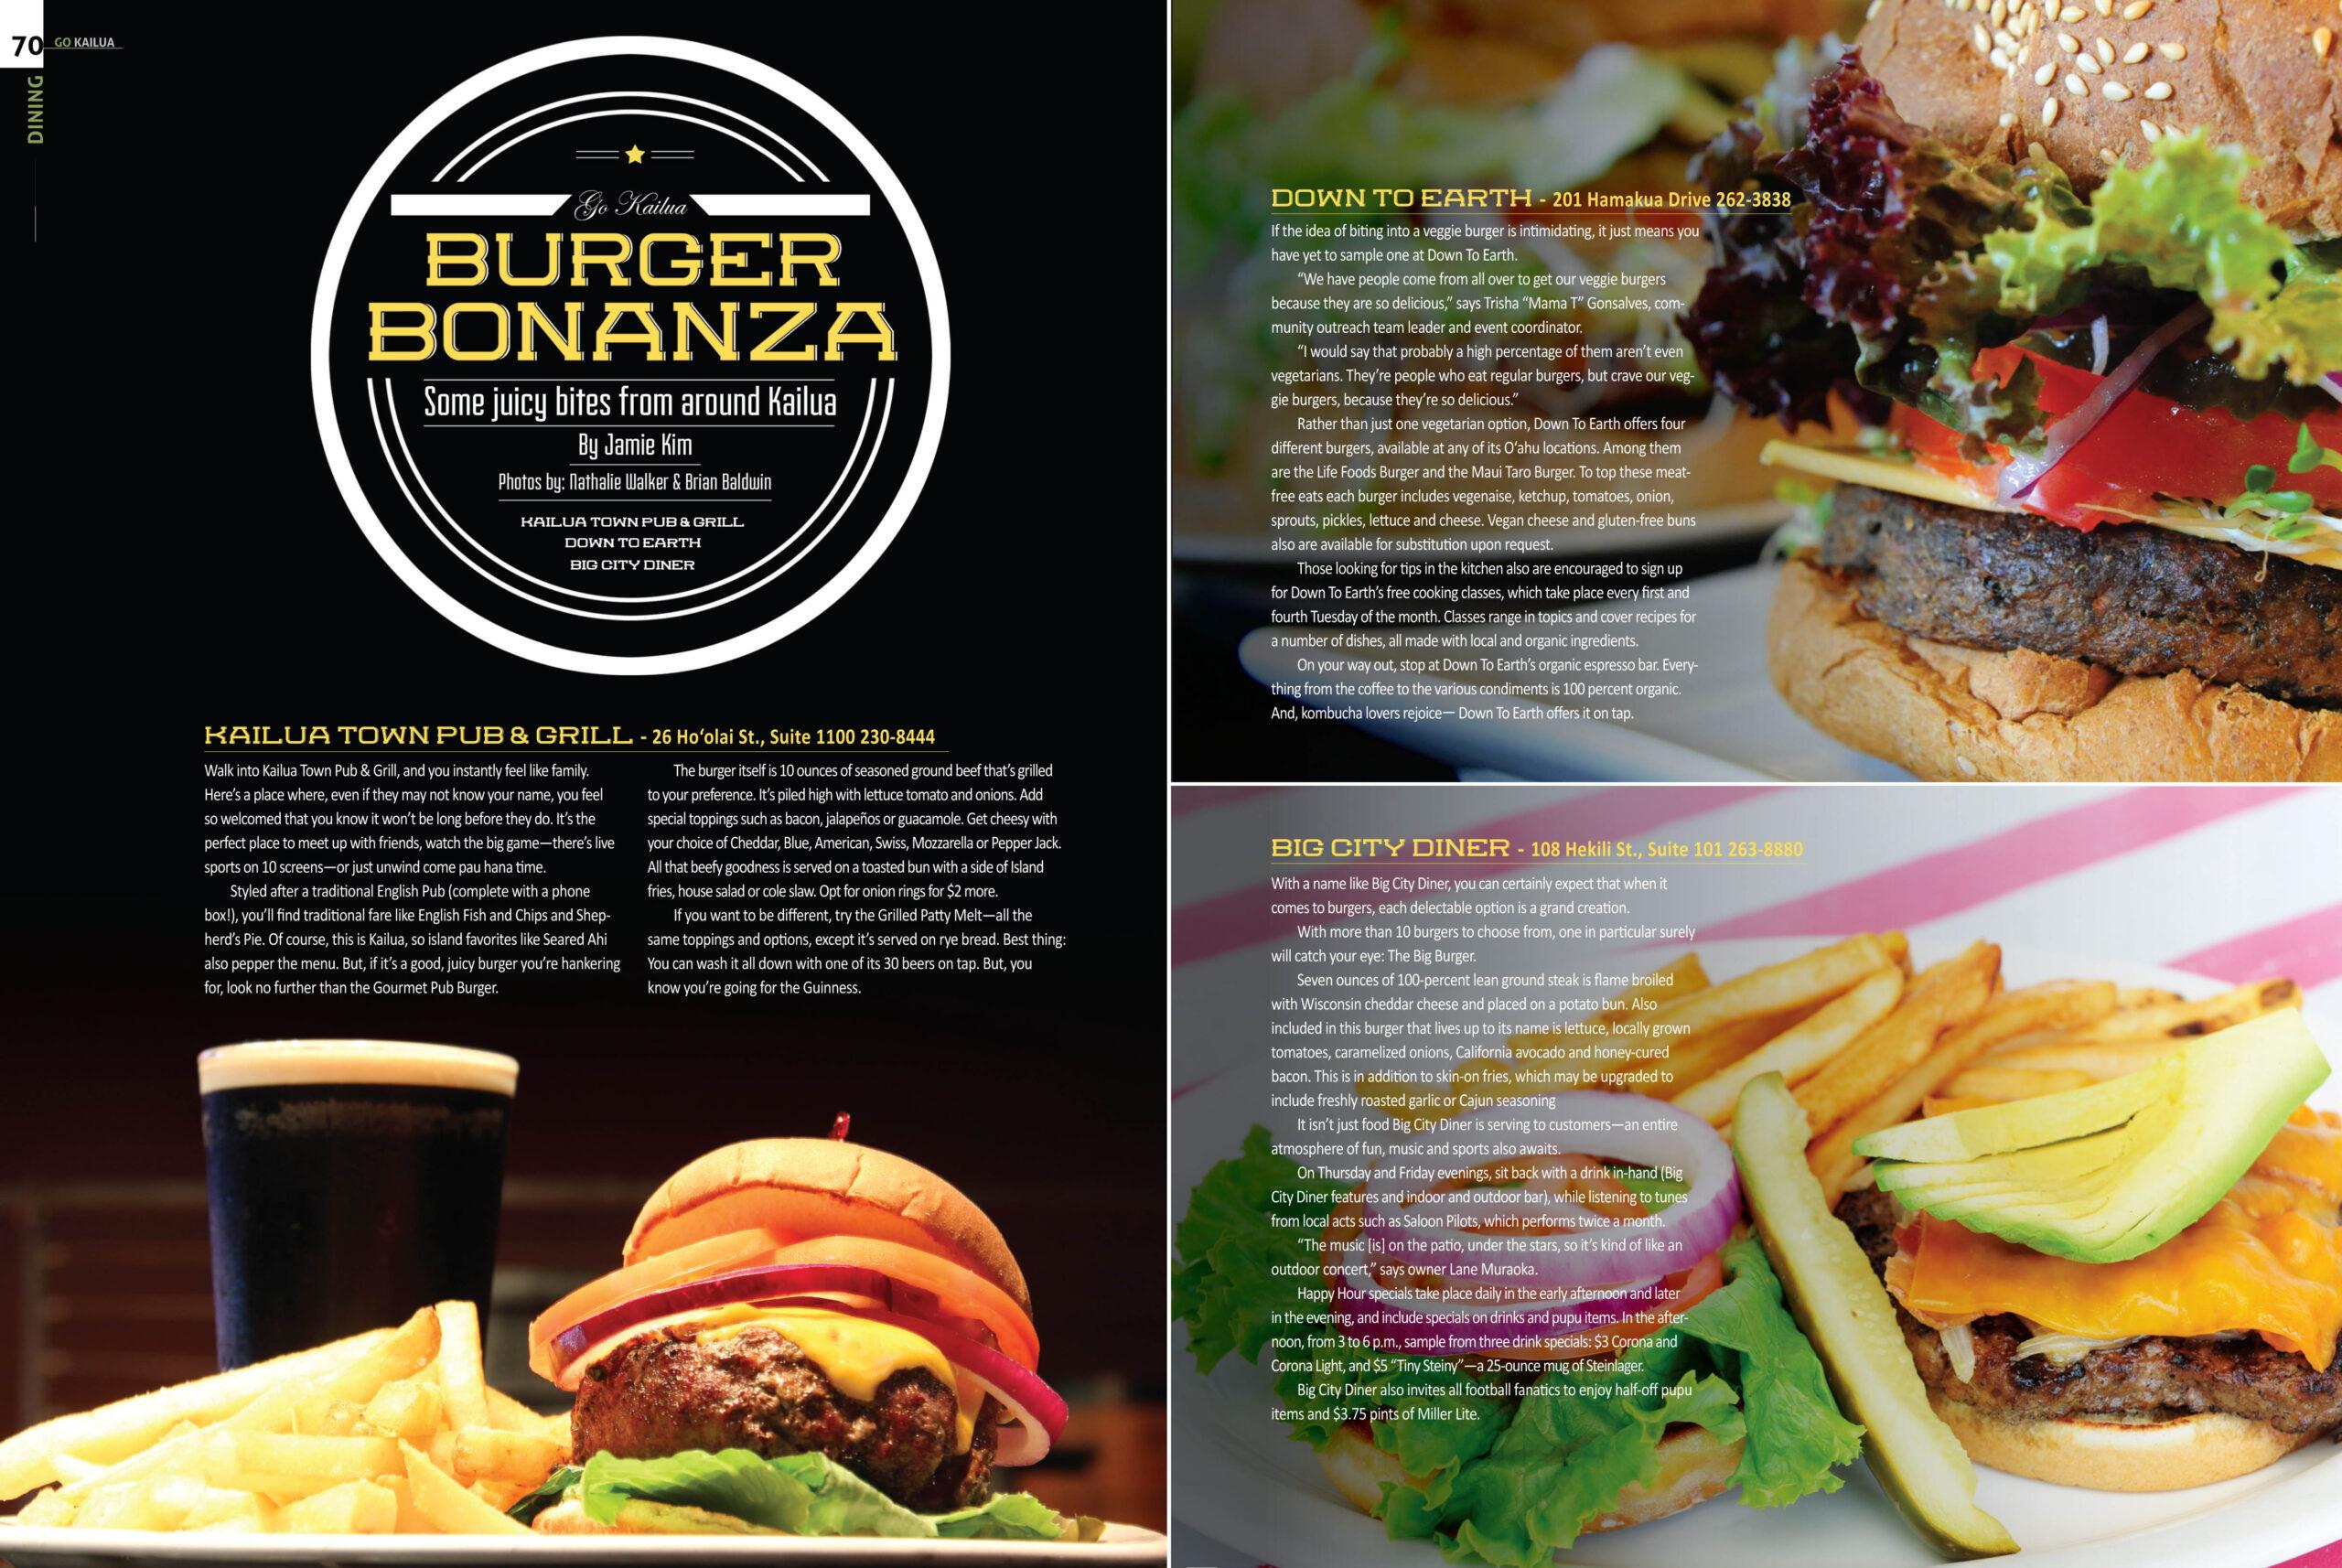 Burger-scaled.jpg